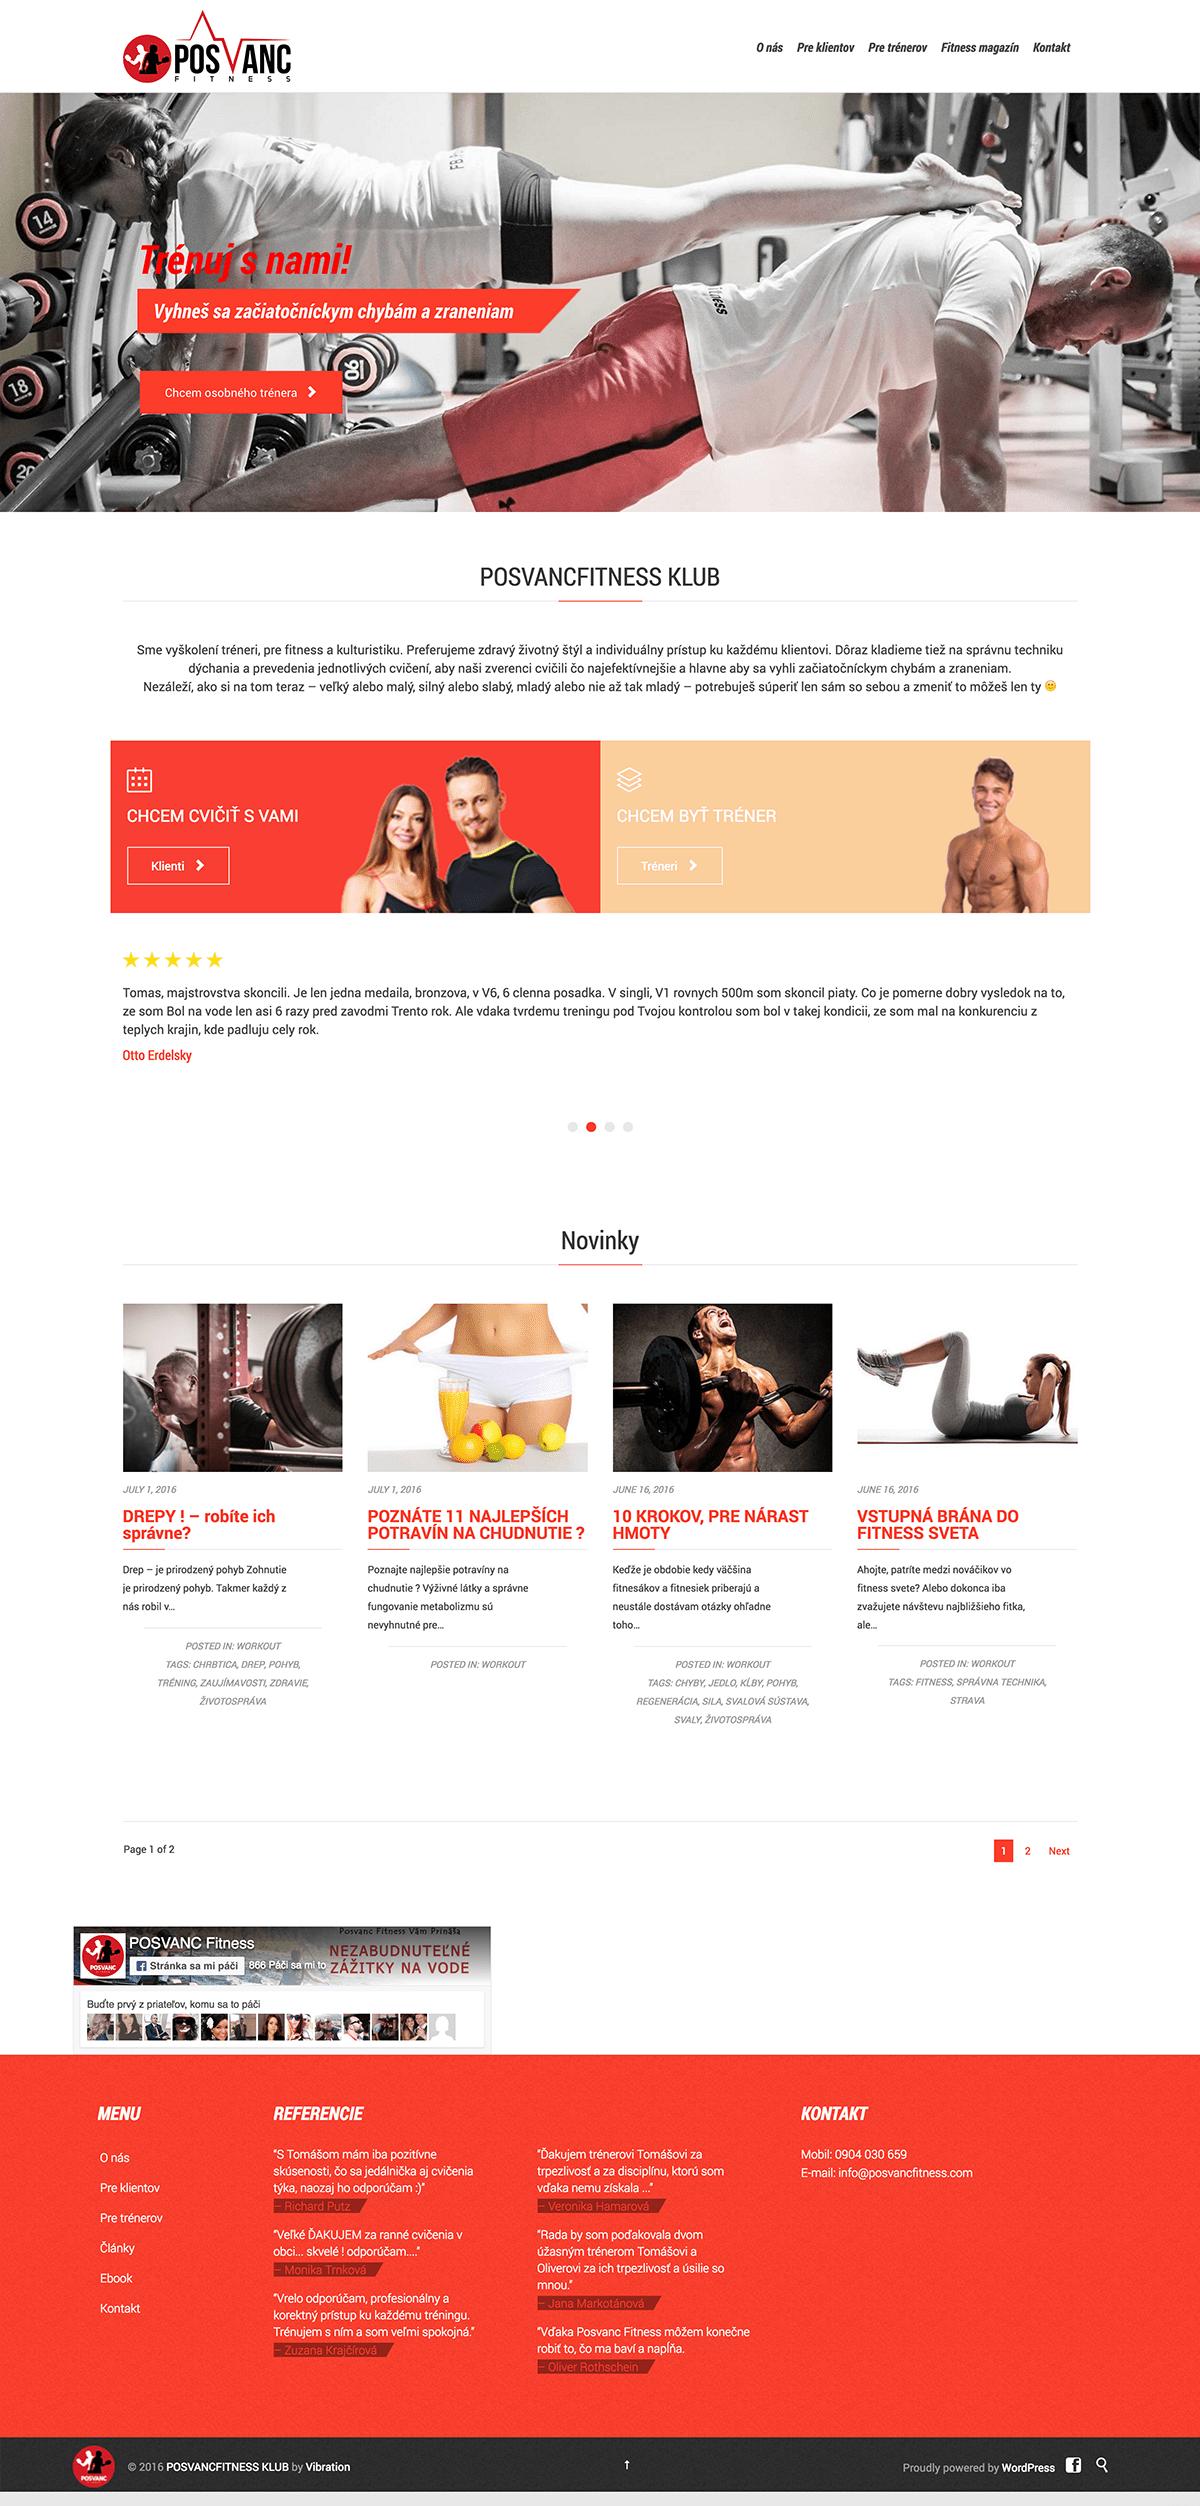 Posvancfitness.com – Osobný fitness tréner v Bratislave copy